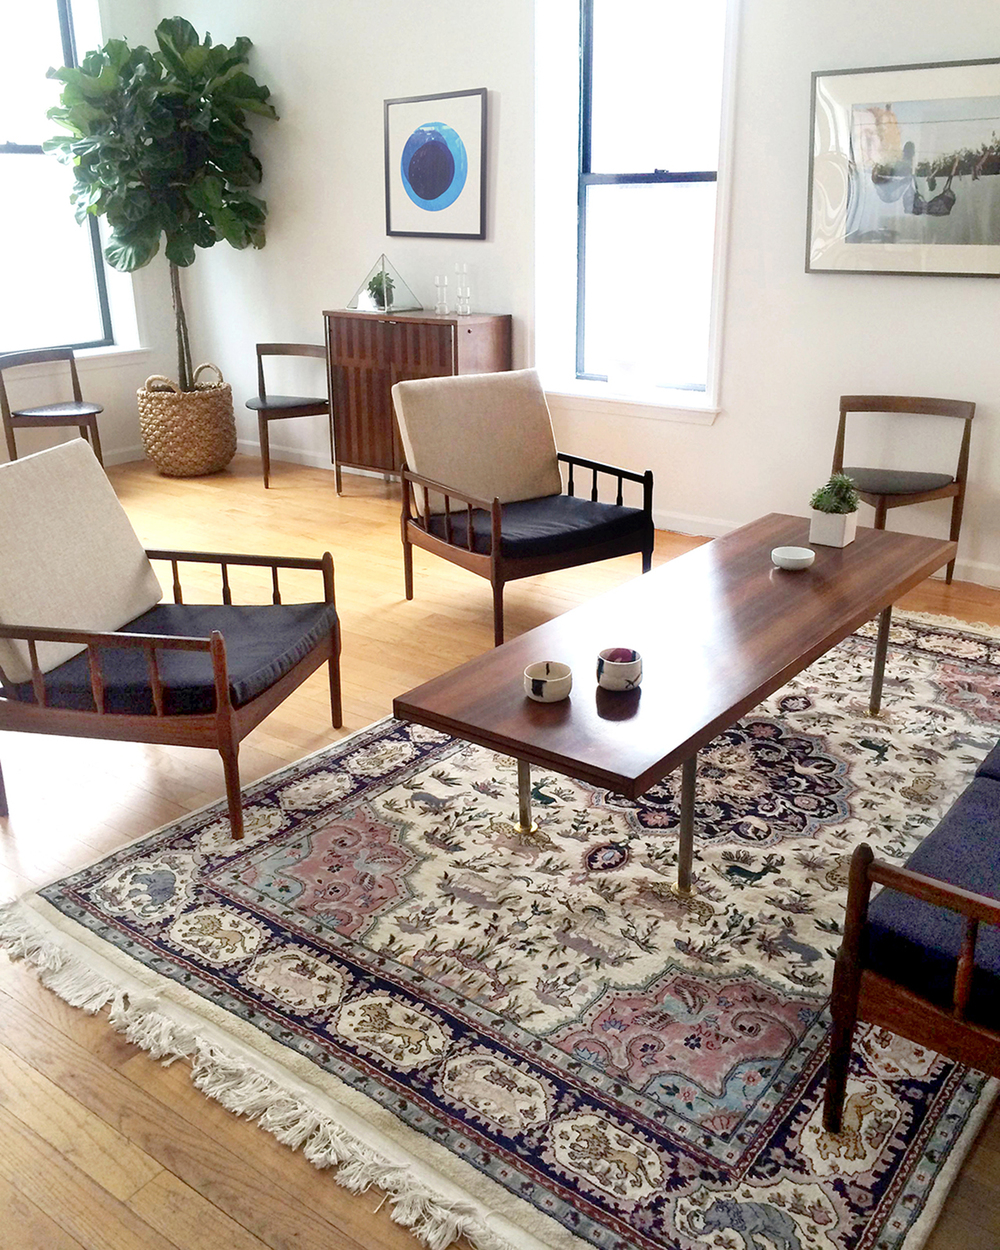 Araks Chairs.jpg